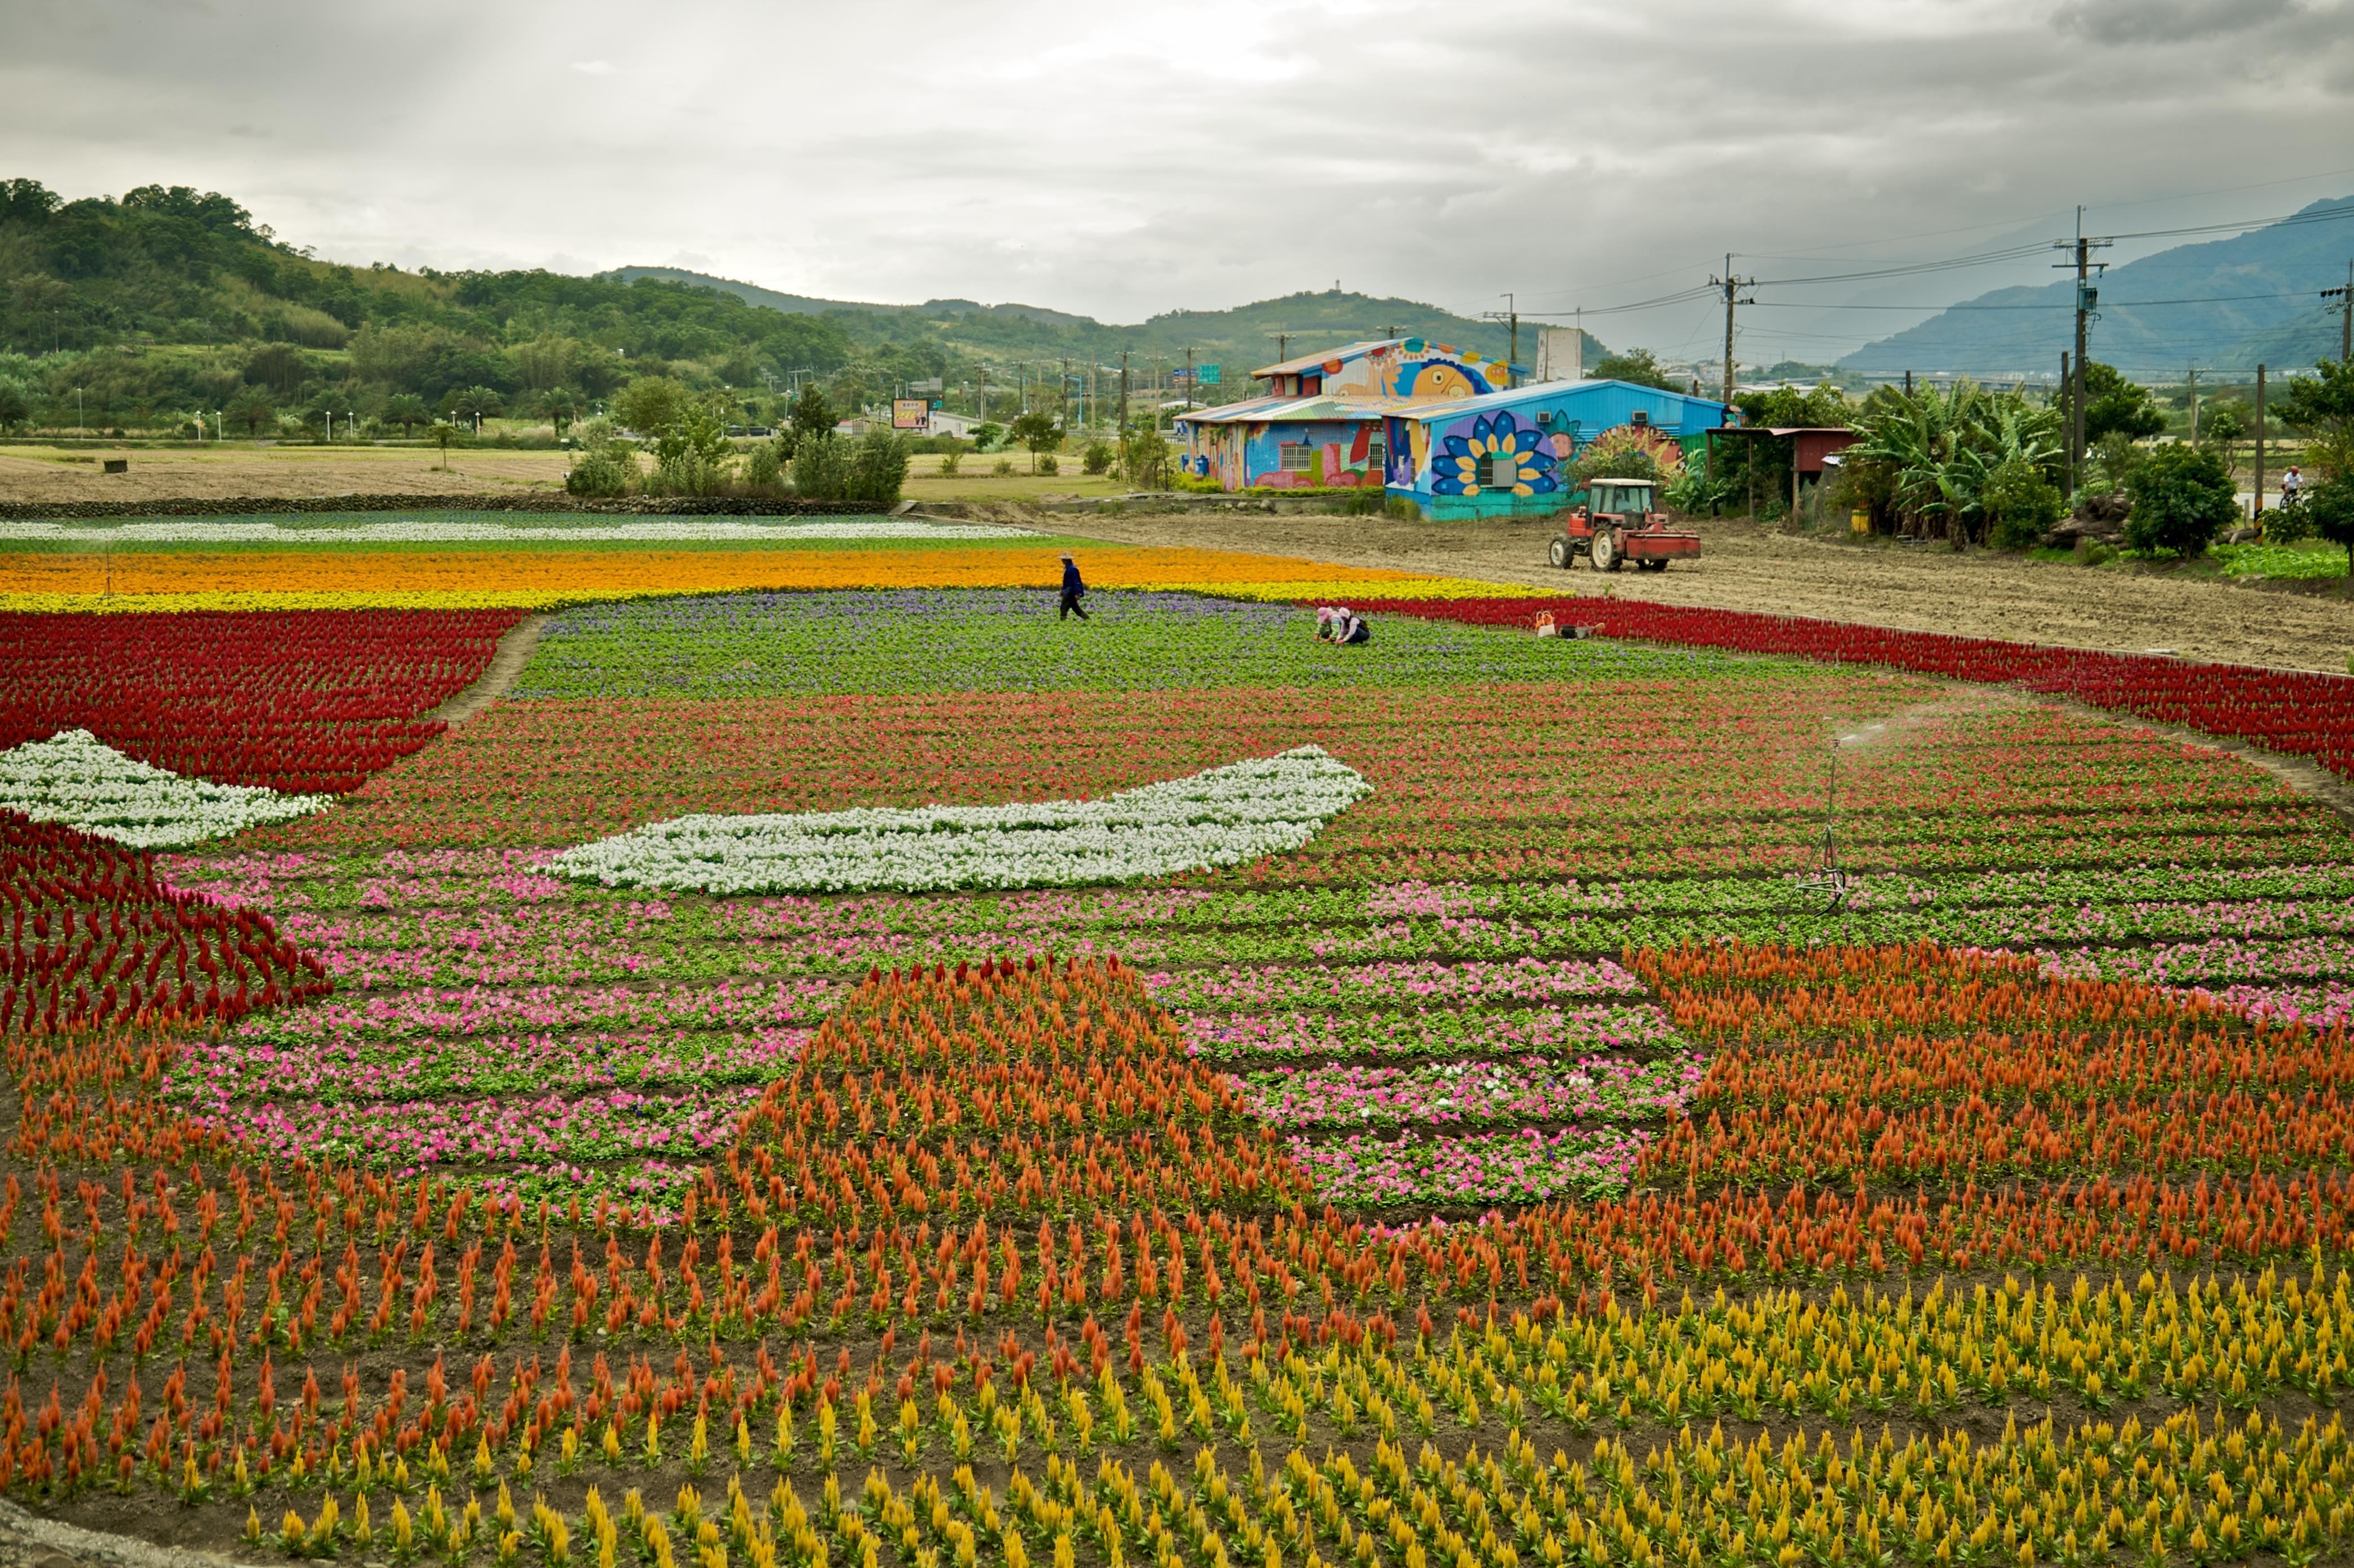 Garden - Wikipedia